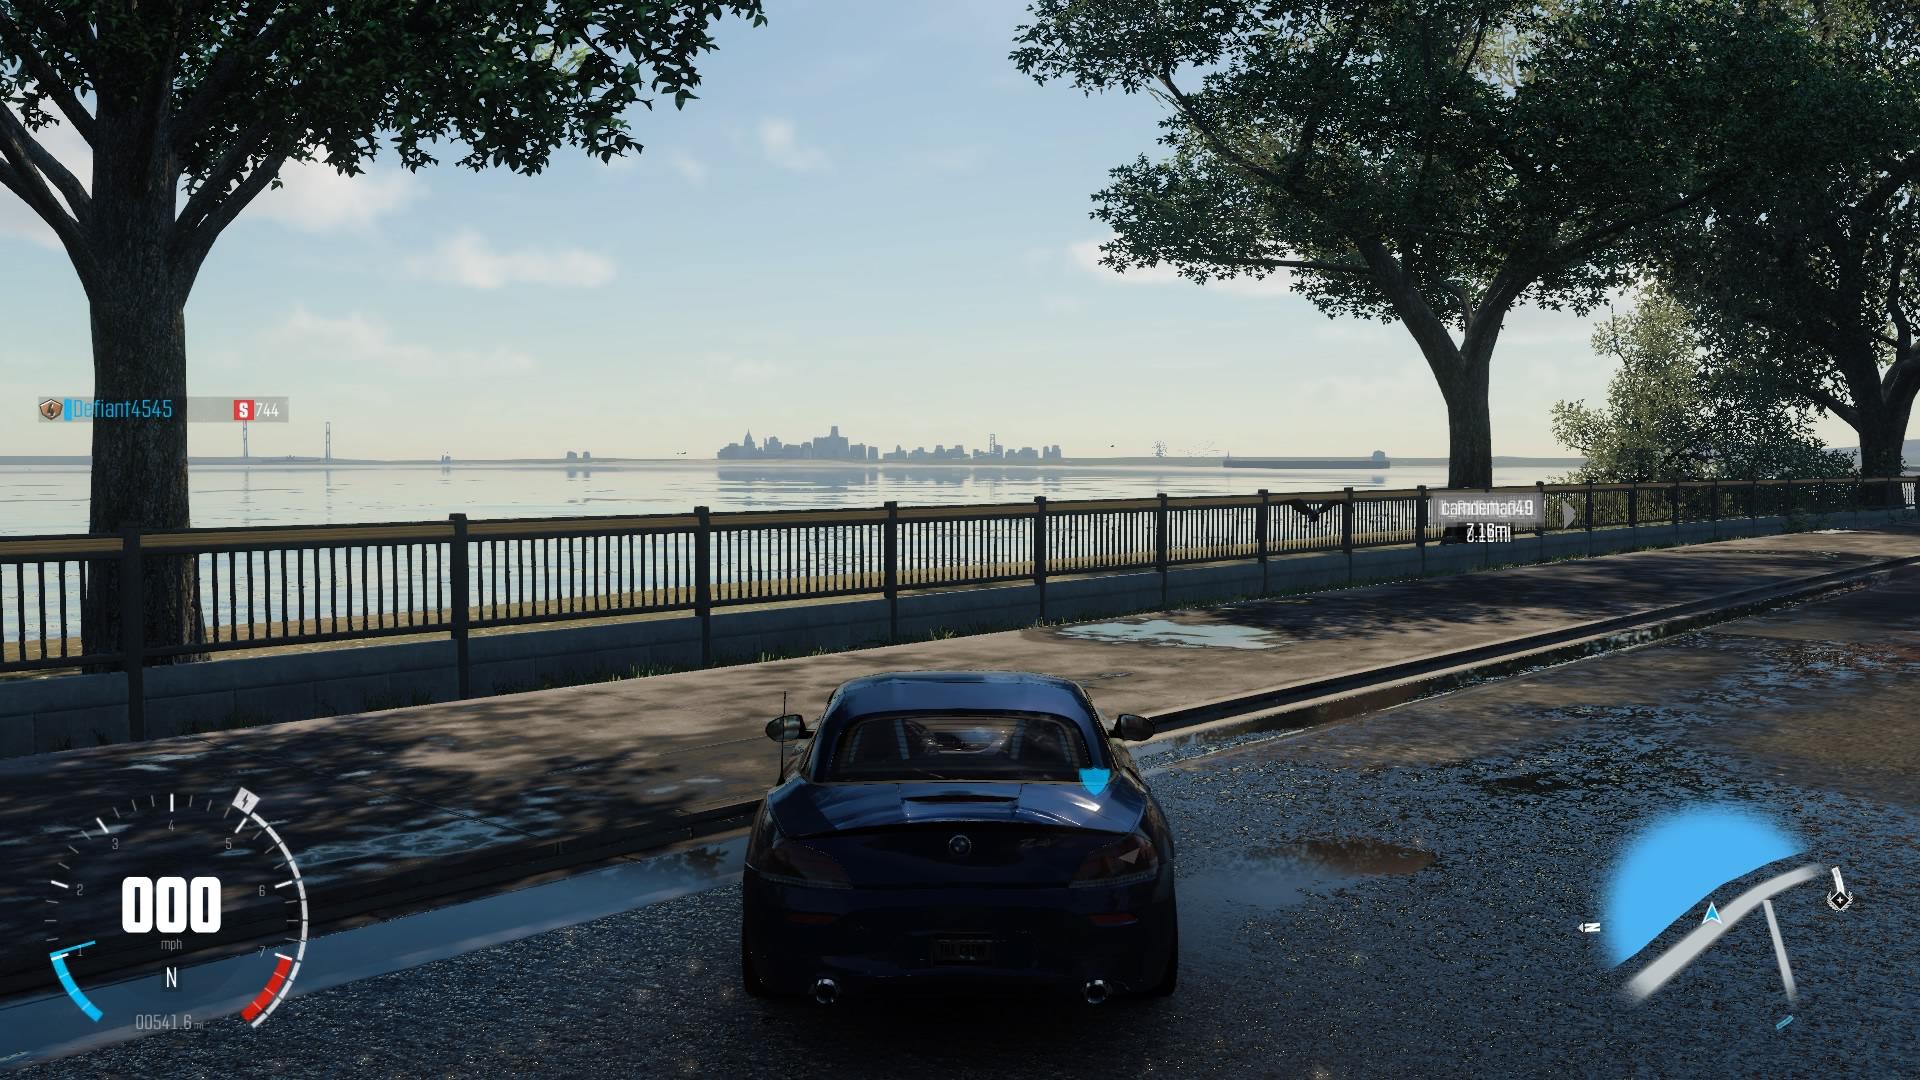 Detroit Skyline in the distance